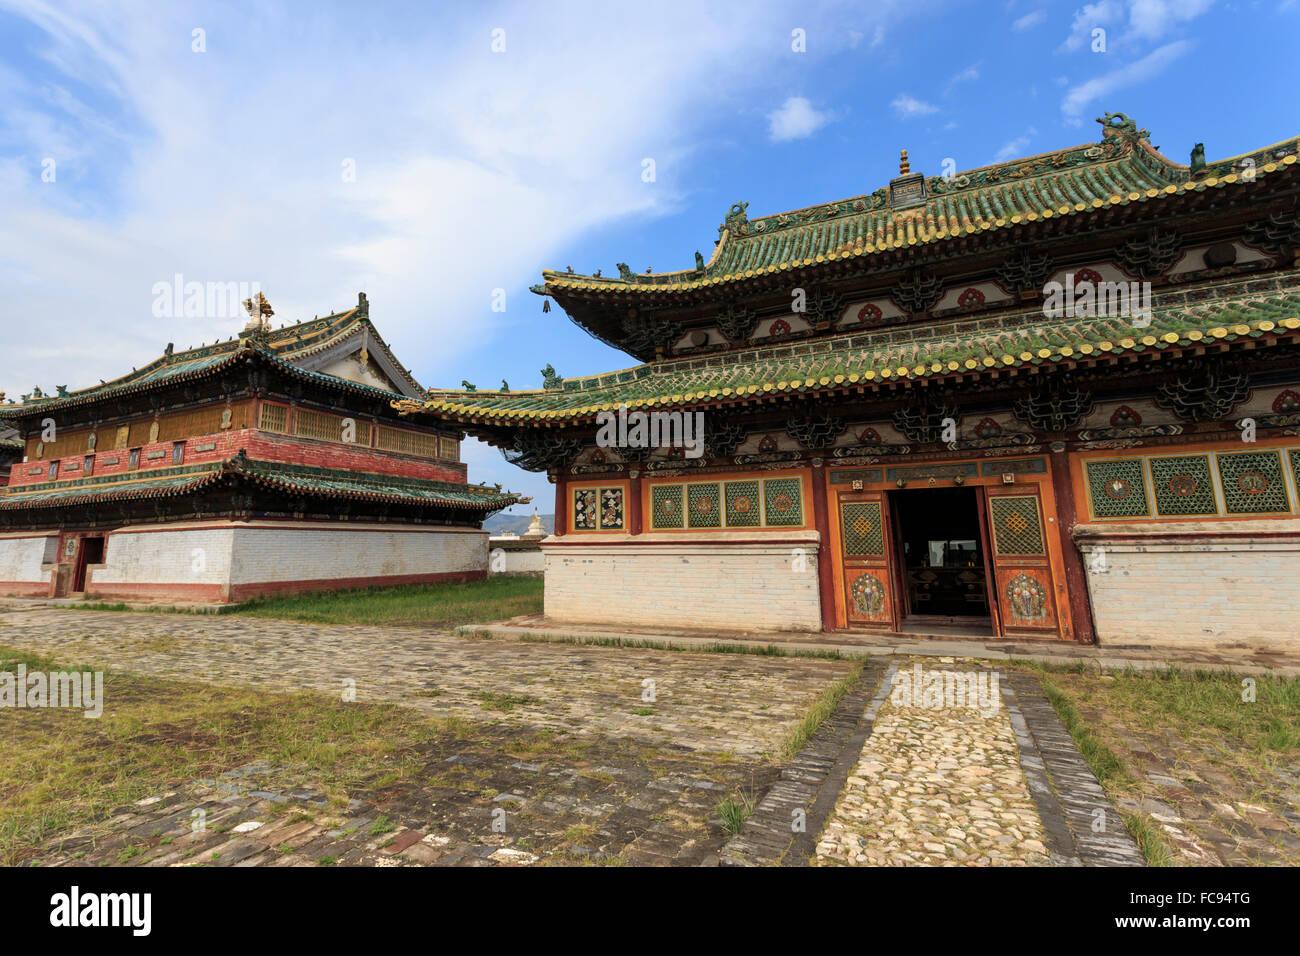 Zuun Zuu temple, Erdene Zuu Khiid, Buddhist Monastery, Kharkhorin (Karakorum), Central Mongolia, Central Asia, Asia - Stock Image